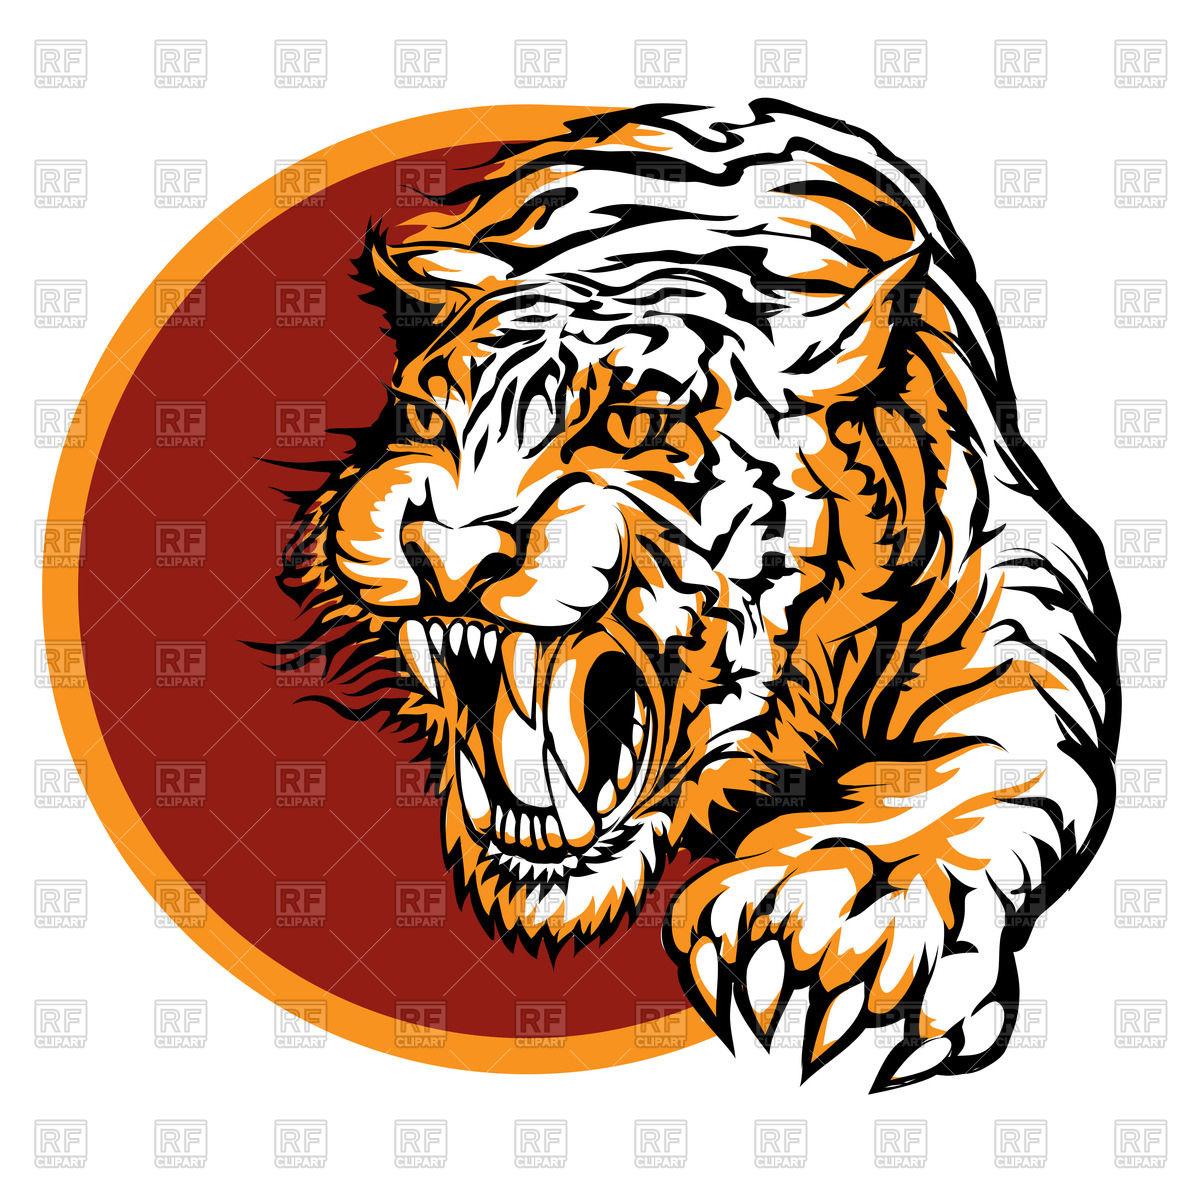 1200x1200 Roaring tiger logo Royalty Free Vector Clip Art Image